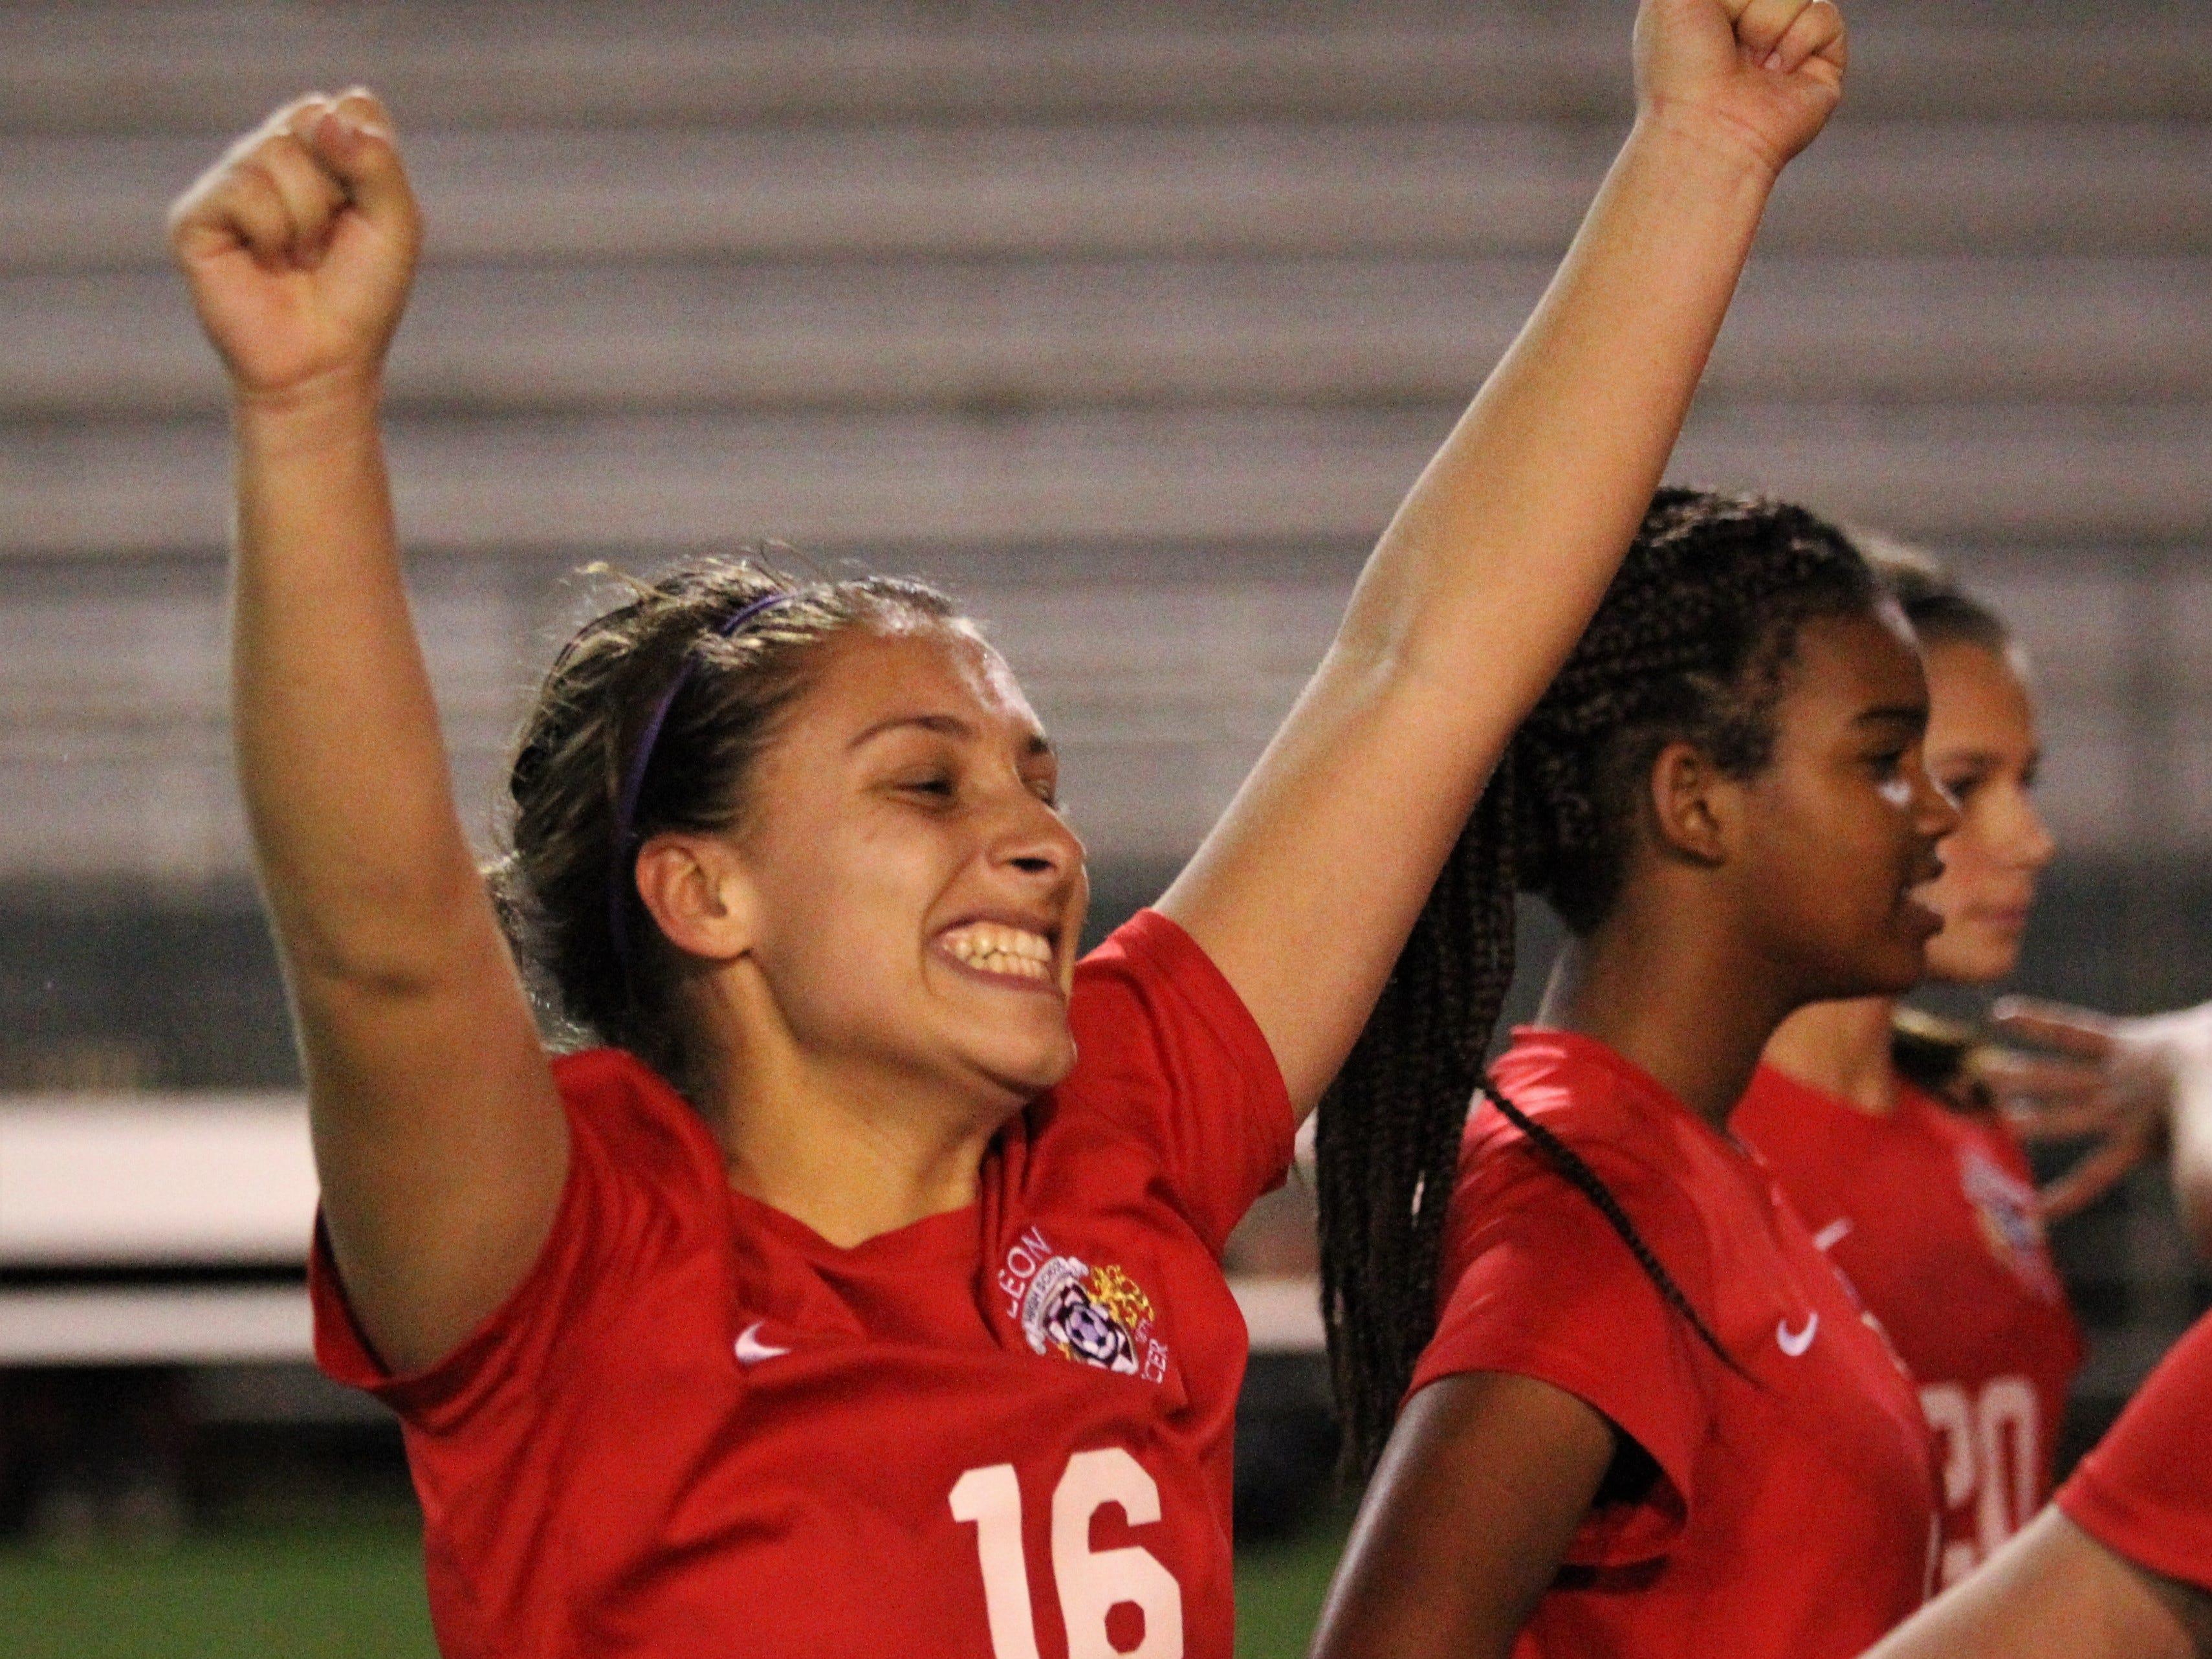 Leon senior midfielder Eden Kirn, who scored the game-winning goal, celebrates as Leon's girls soccer team beat Lincoln 2-1 in the District 2-4A championship at Gene Cox Stadium on Feb. 1, 2019.